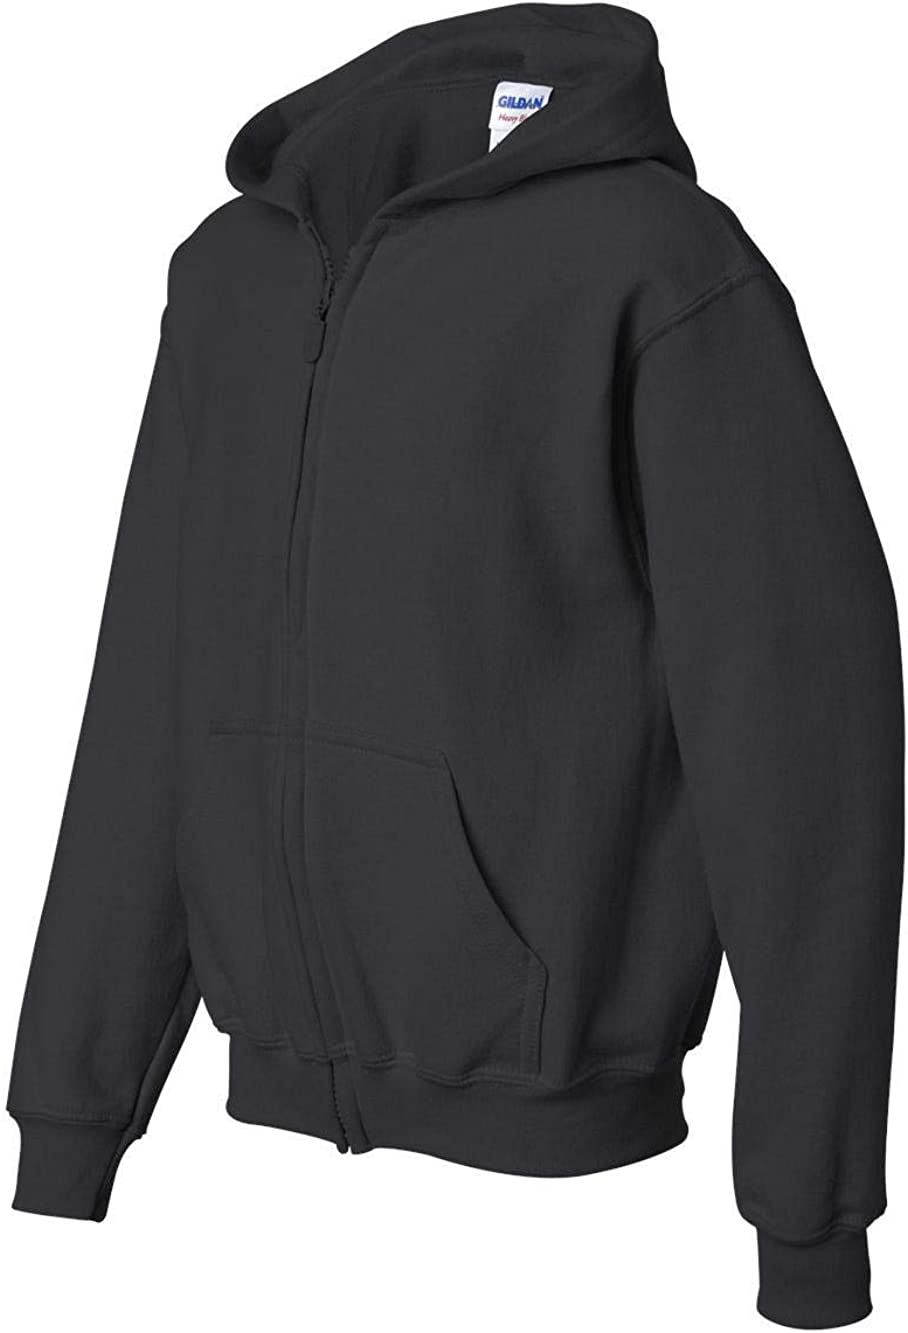 Gildan Big Boys Heavy Blend Ribbed Full-Zip Hooded Sweatshirt